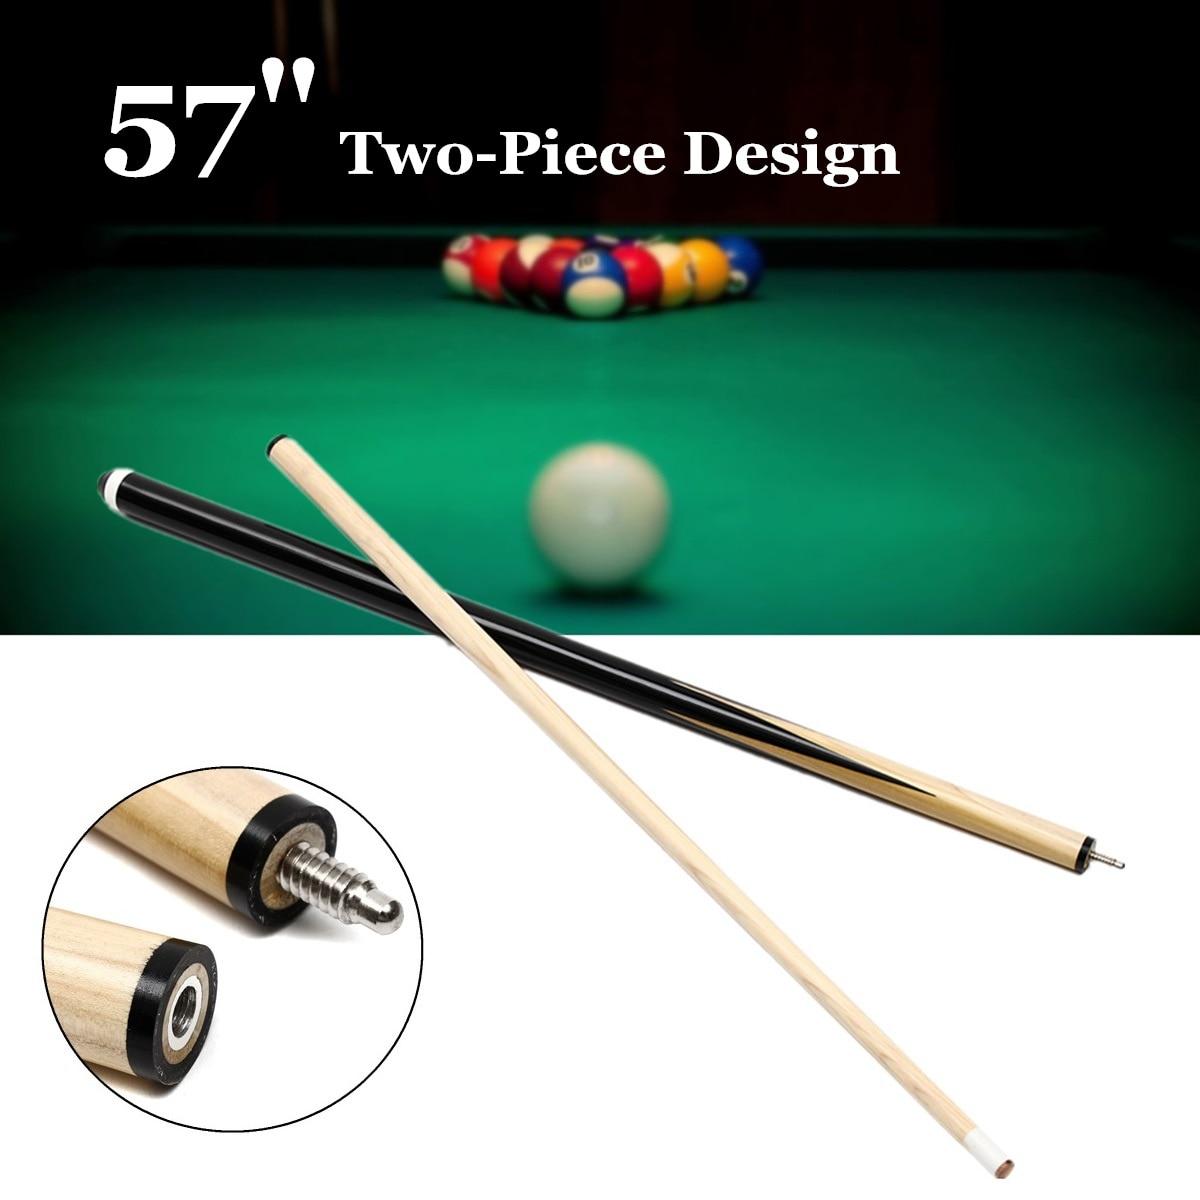 1Pcs 145cm 1/2 Structure Wooden Pool Cue Billiard House Bar Pool Cue Sticks Entertainmen ...